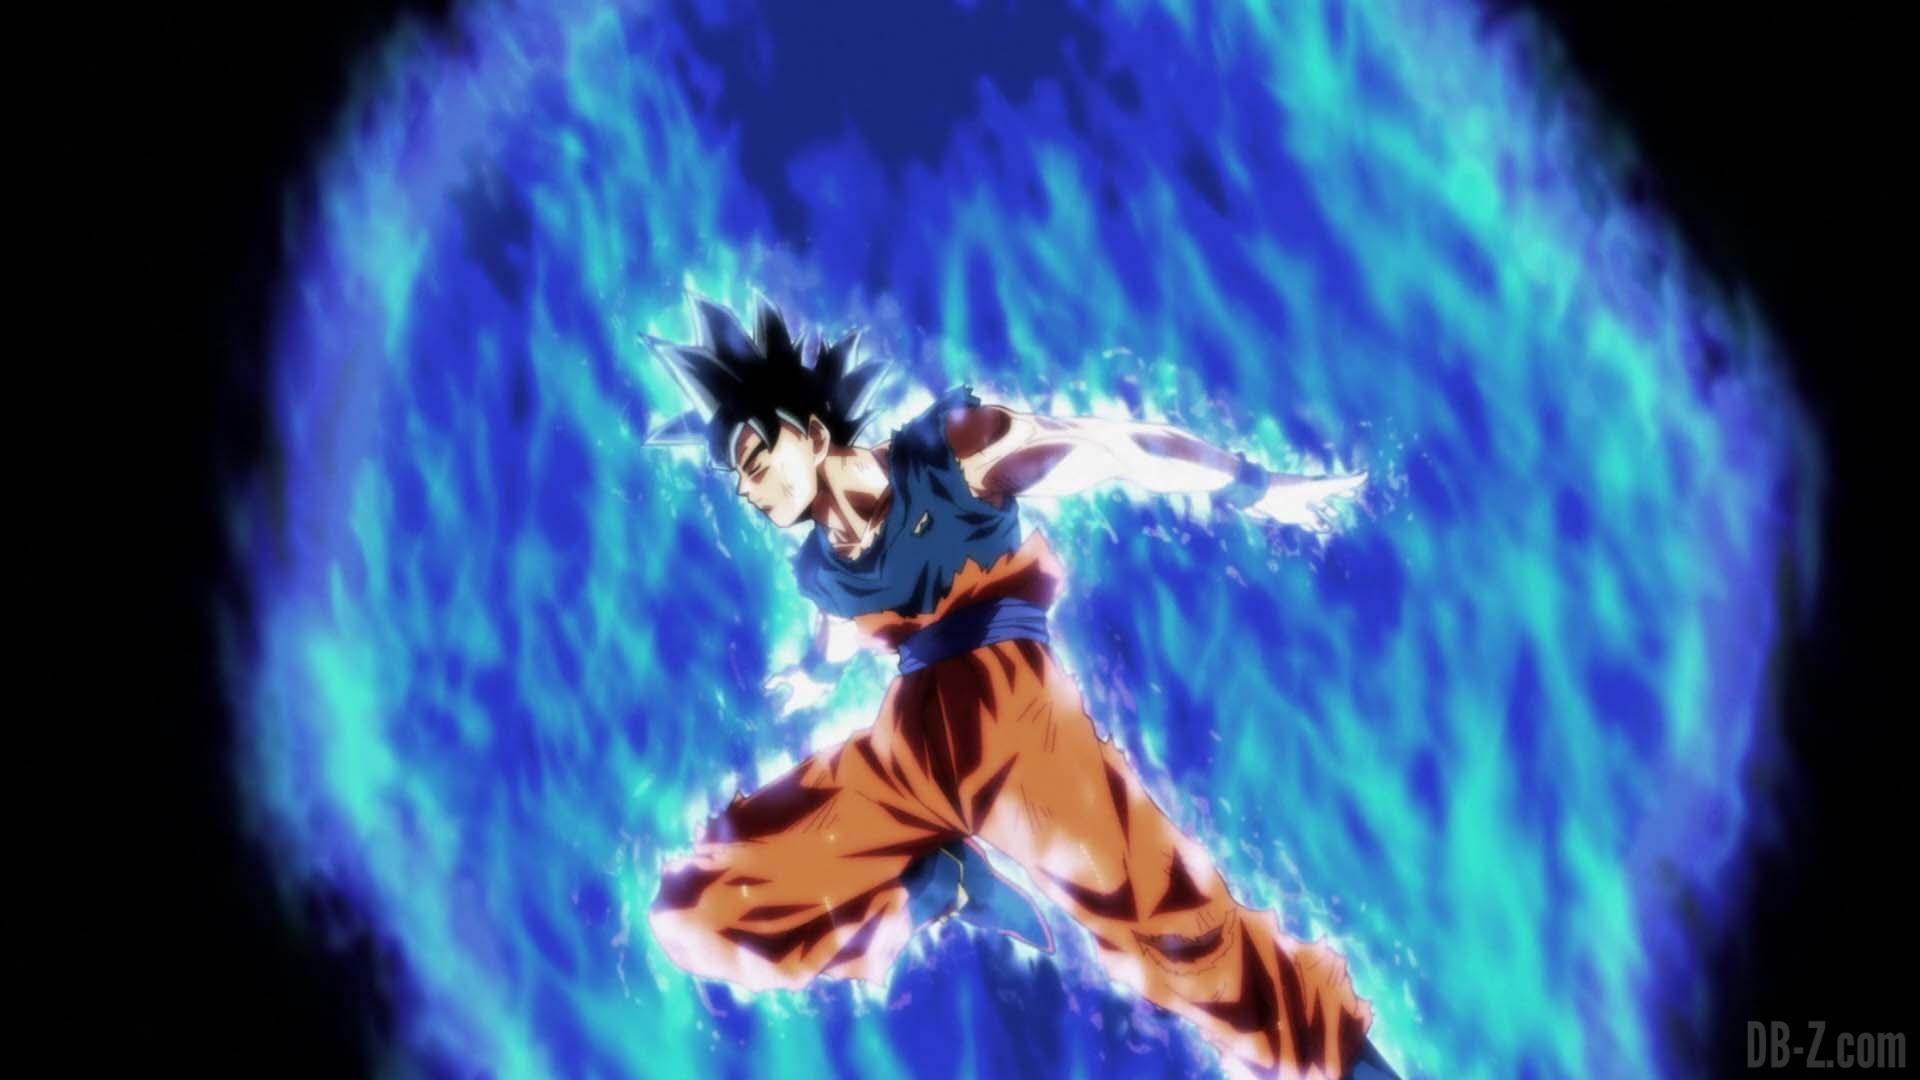 Image Dragon Ball Super Episode 129 00098 Goku Ultra Instinct Jpg